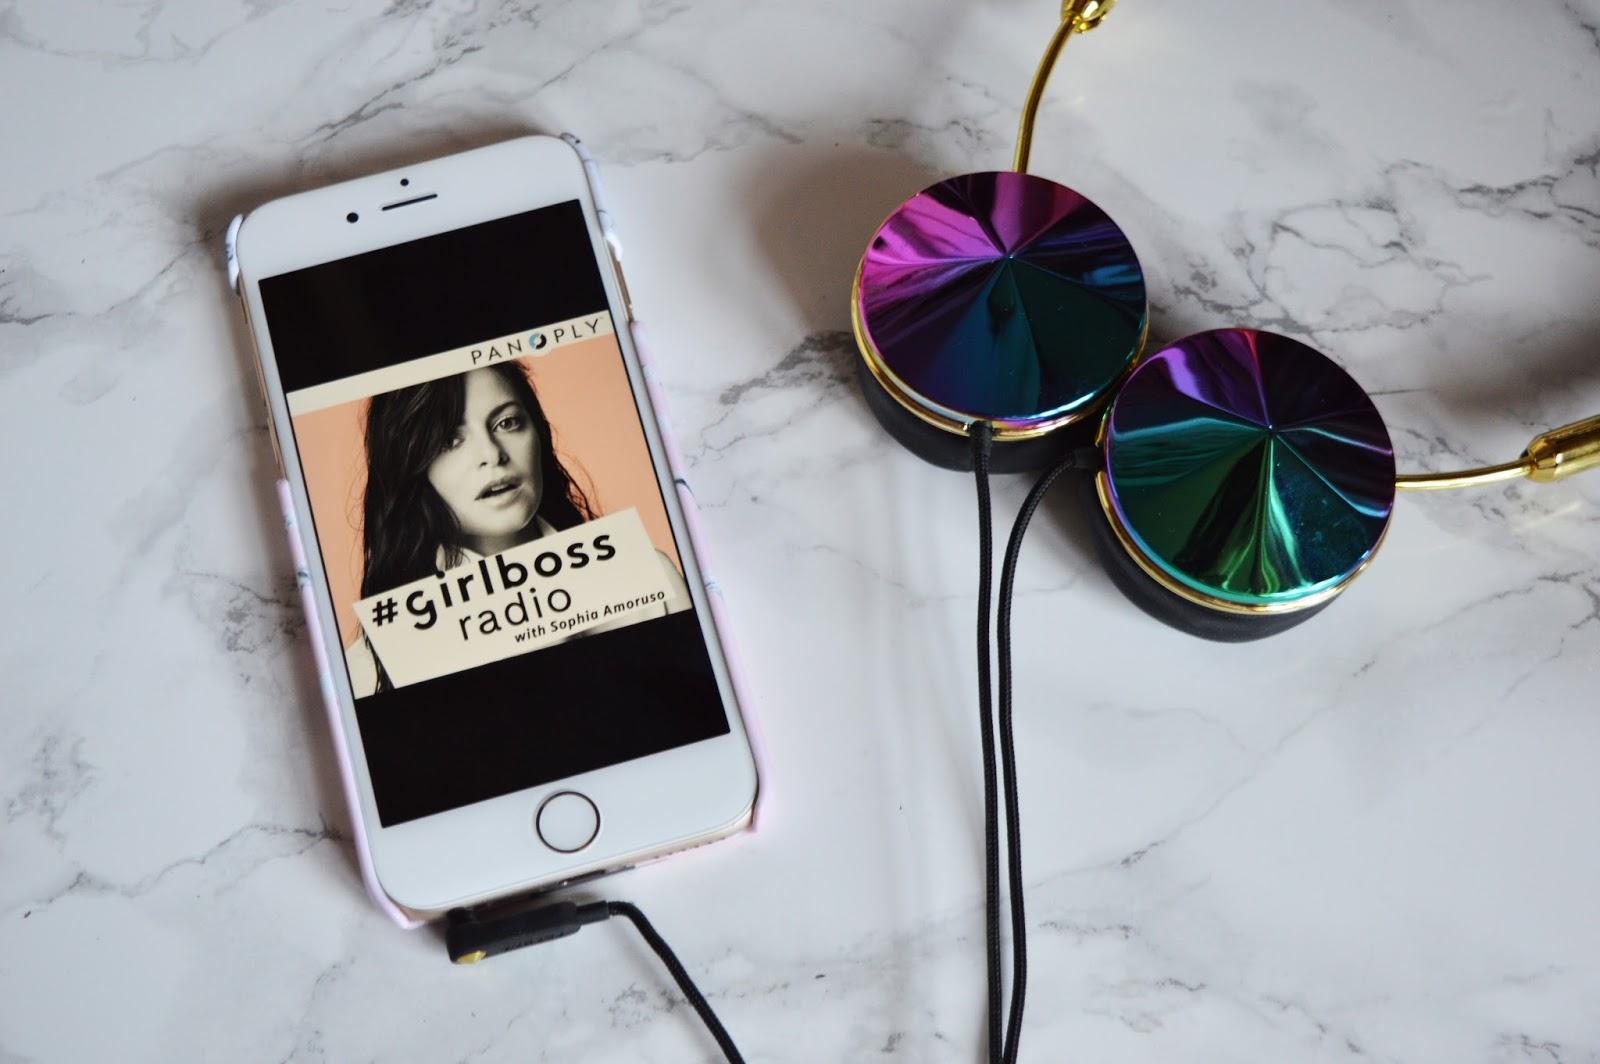 Monday Motivation, Podcasts, Apple, iPhone, Girlboss, Lifestyle, Business